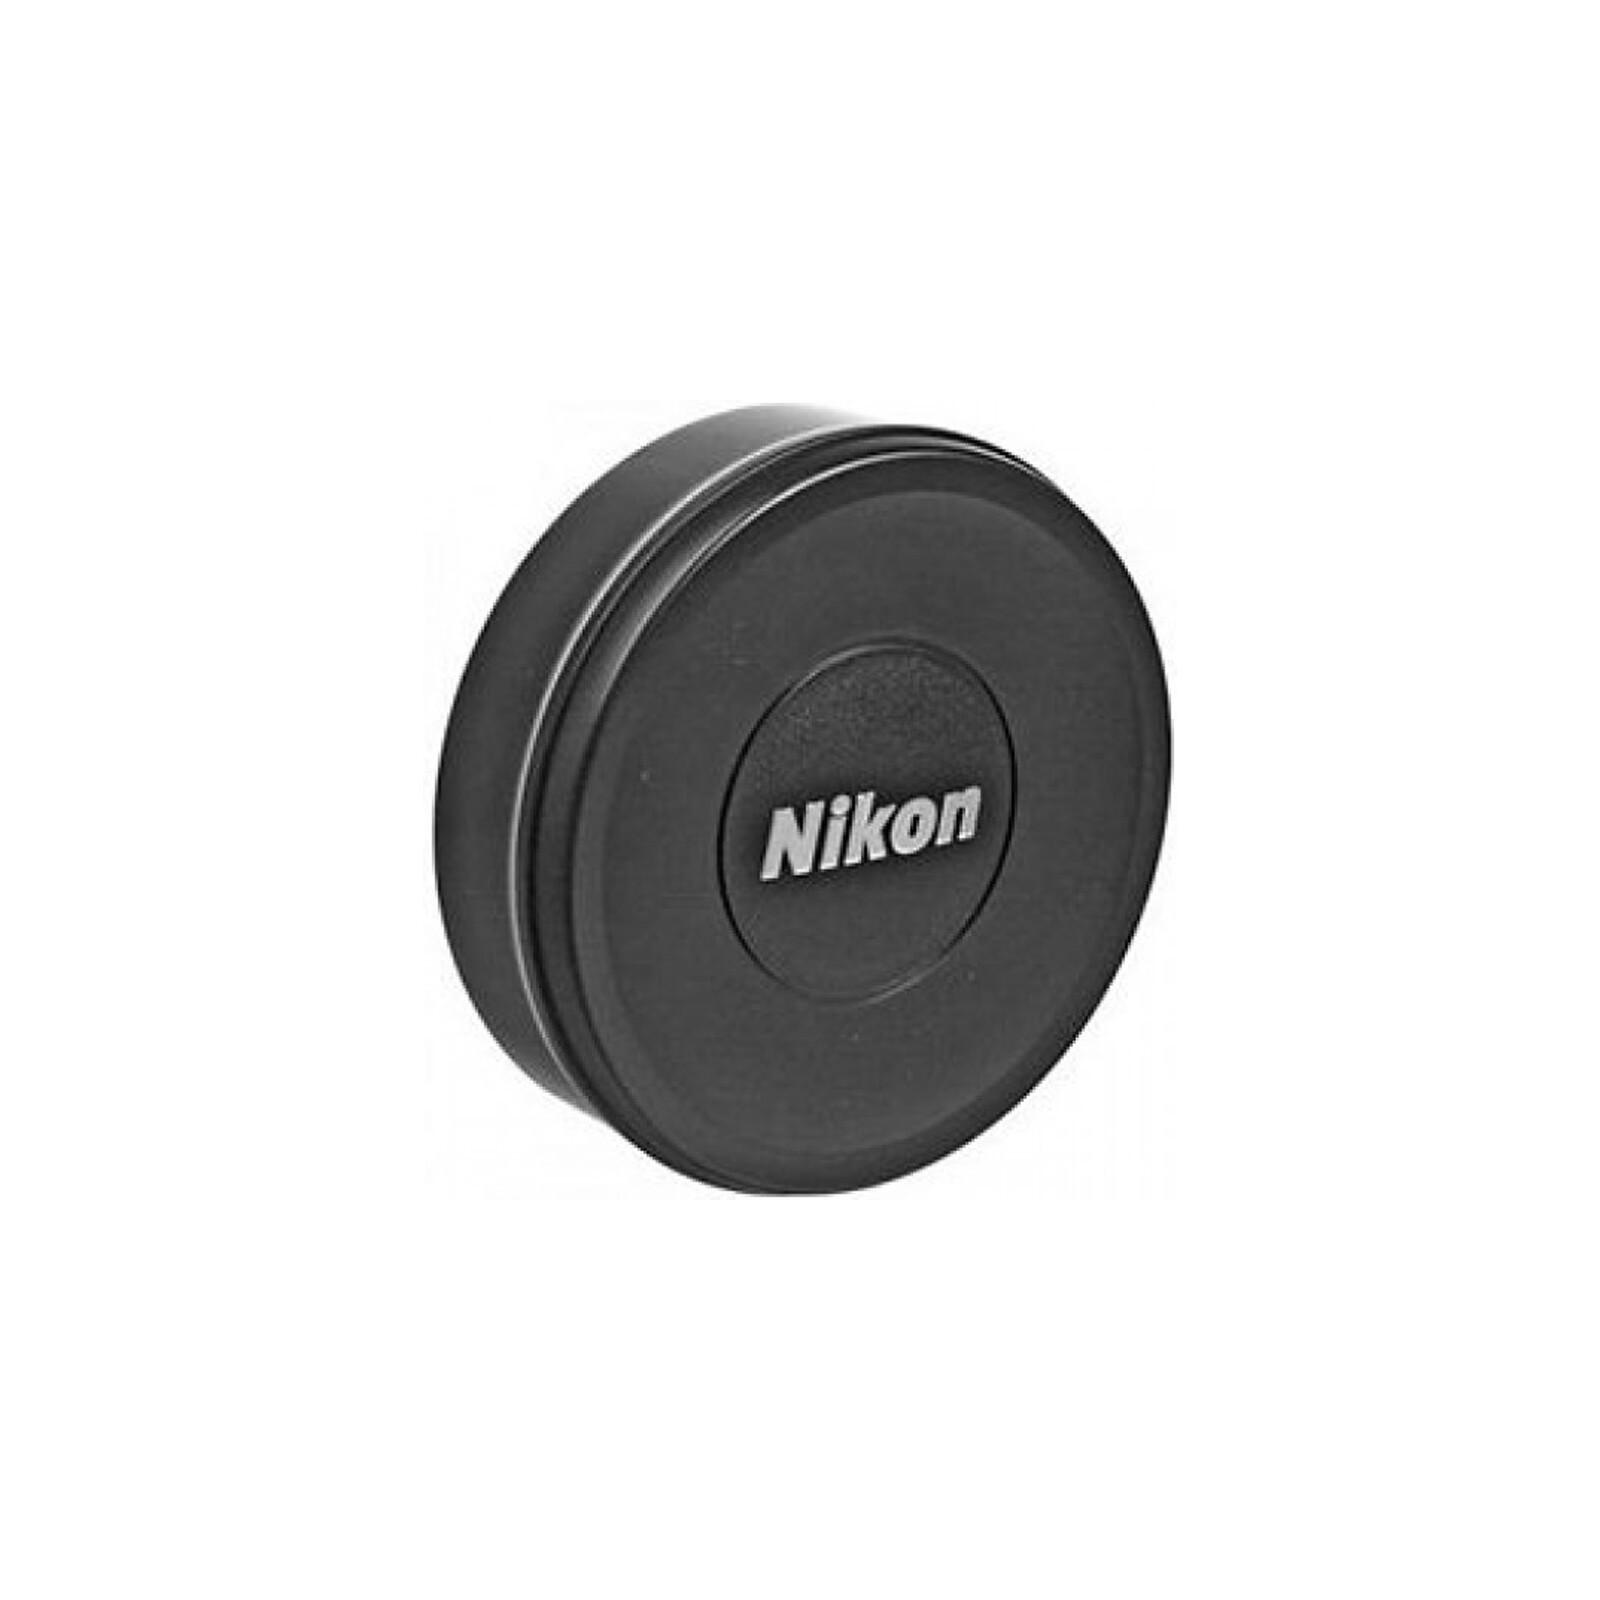 Nikon LC-1424 Objektivdeckel